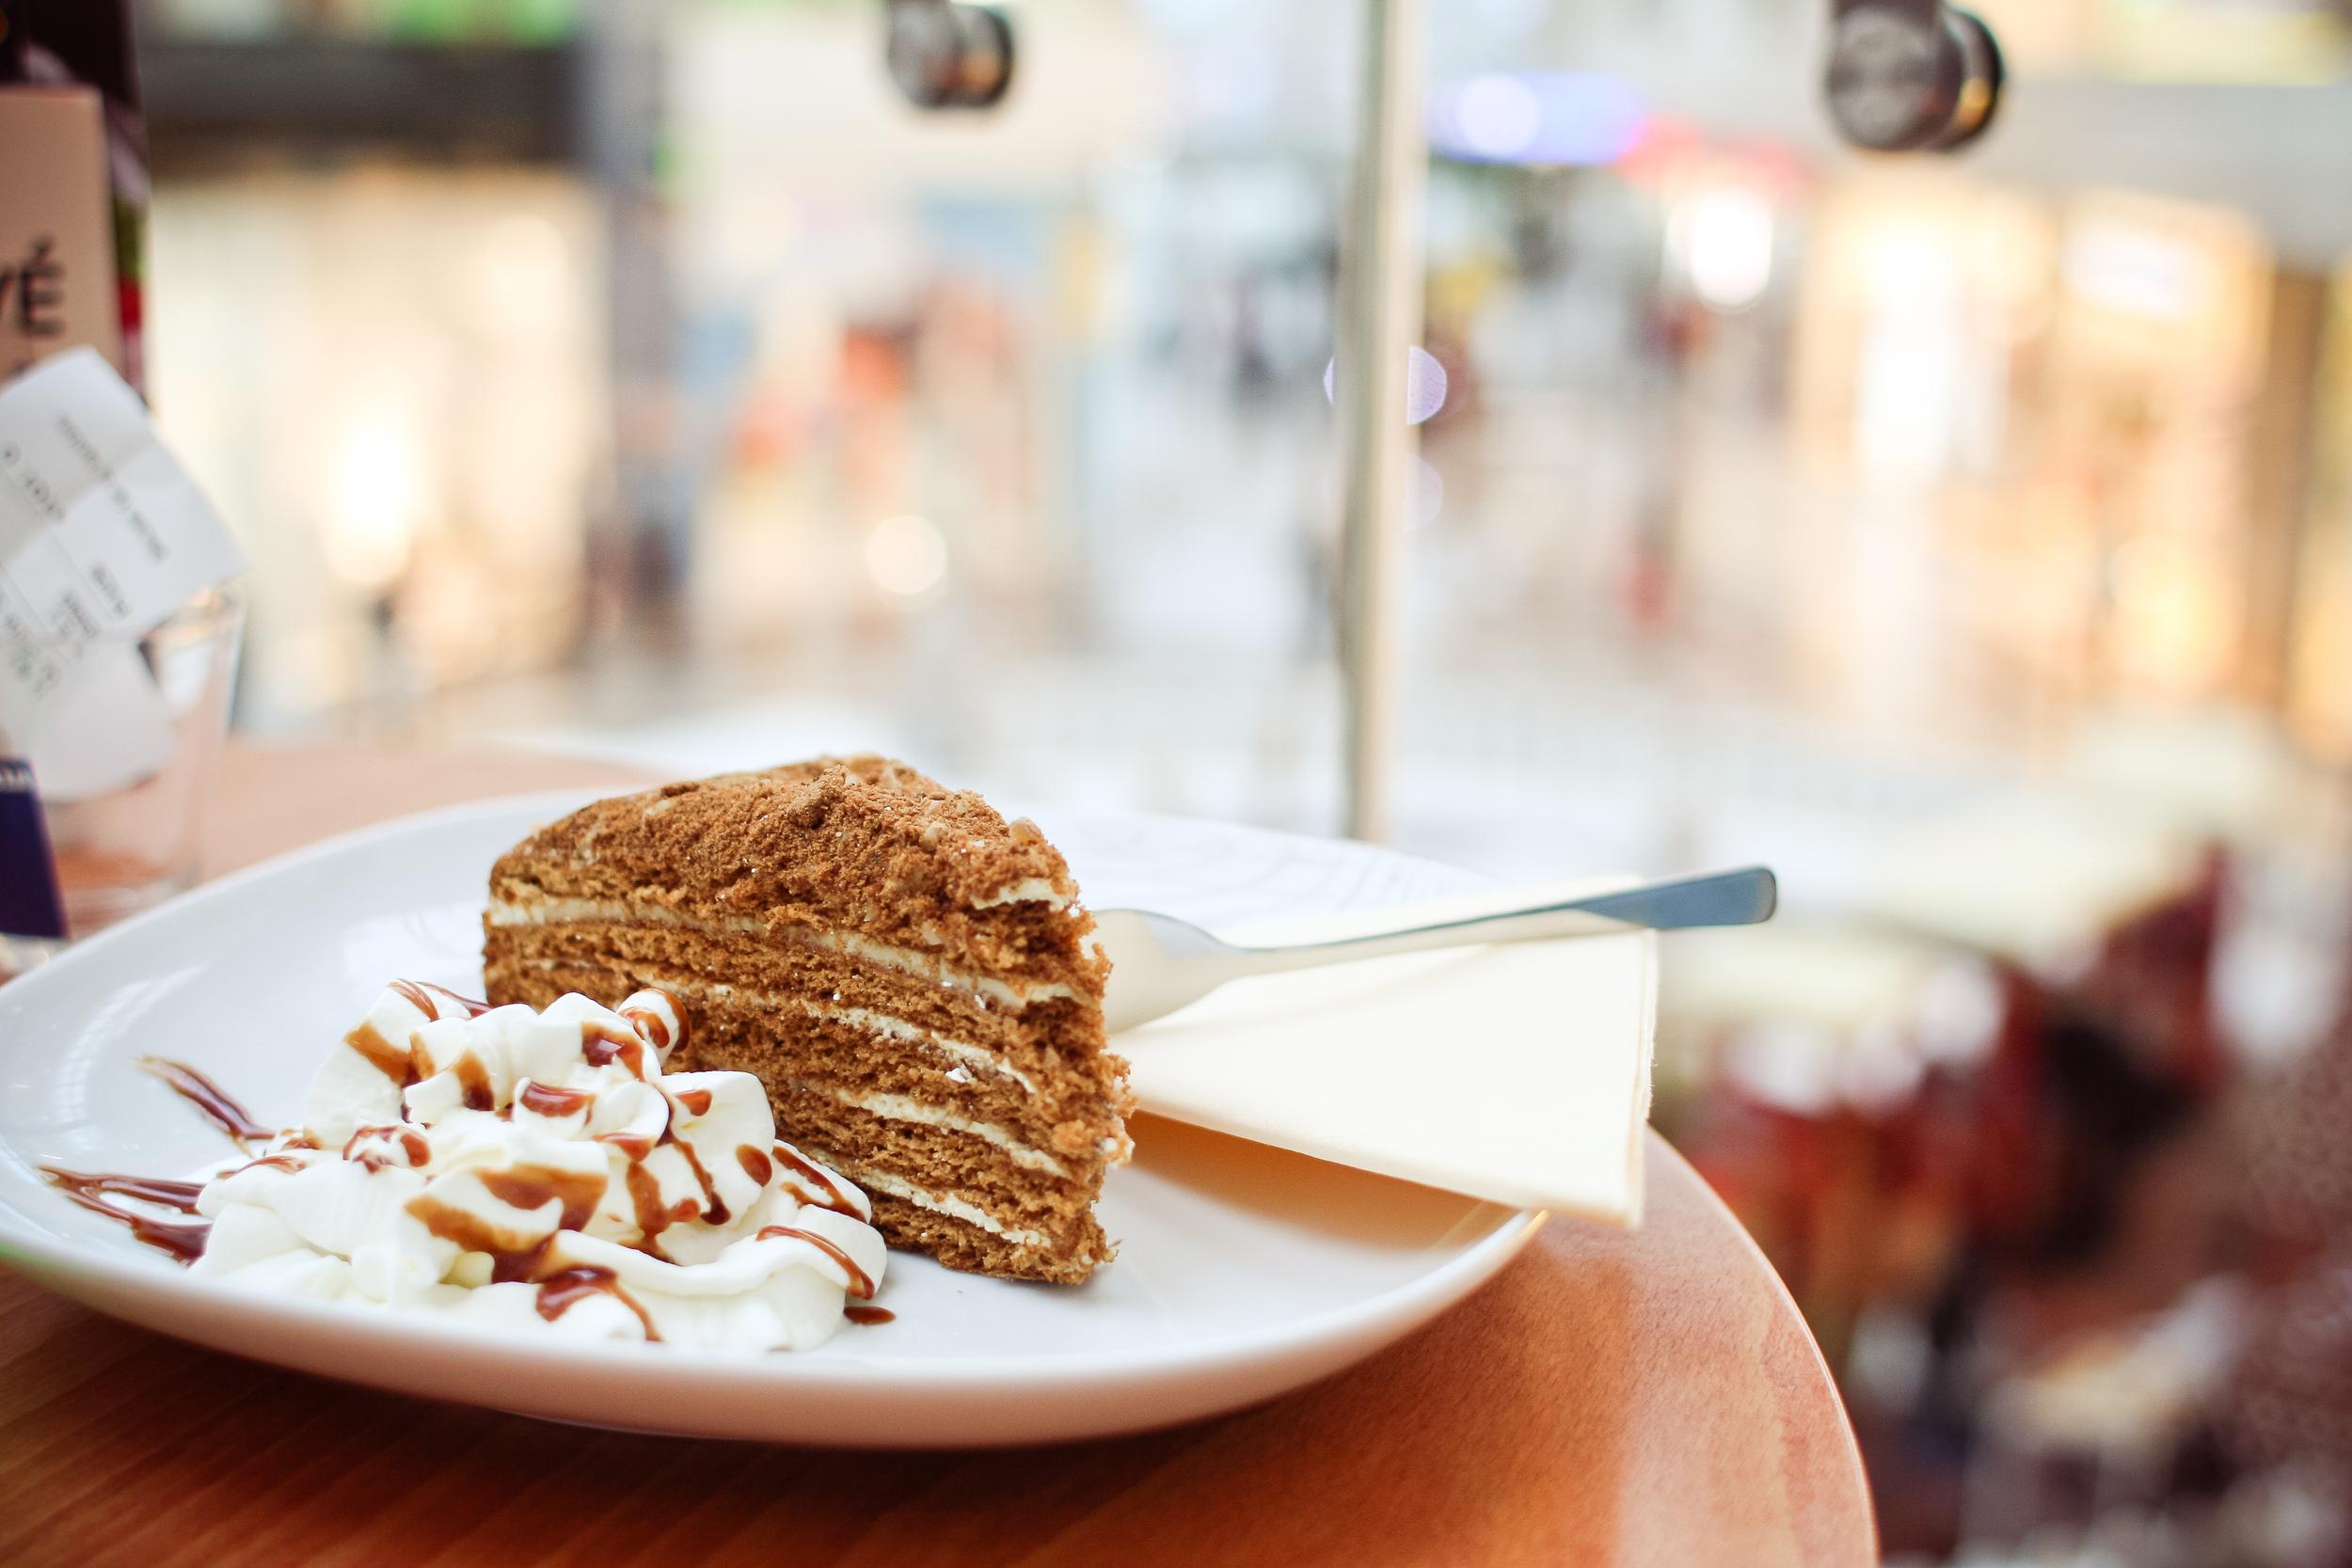 Image Credit: Piece of Honey Cake, by Viktor Hanacek at  PicJumbo